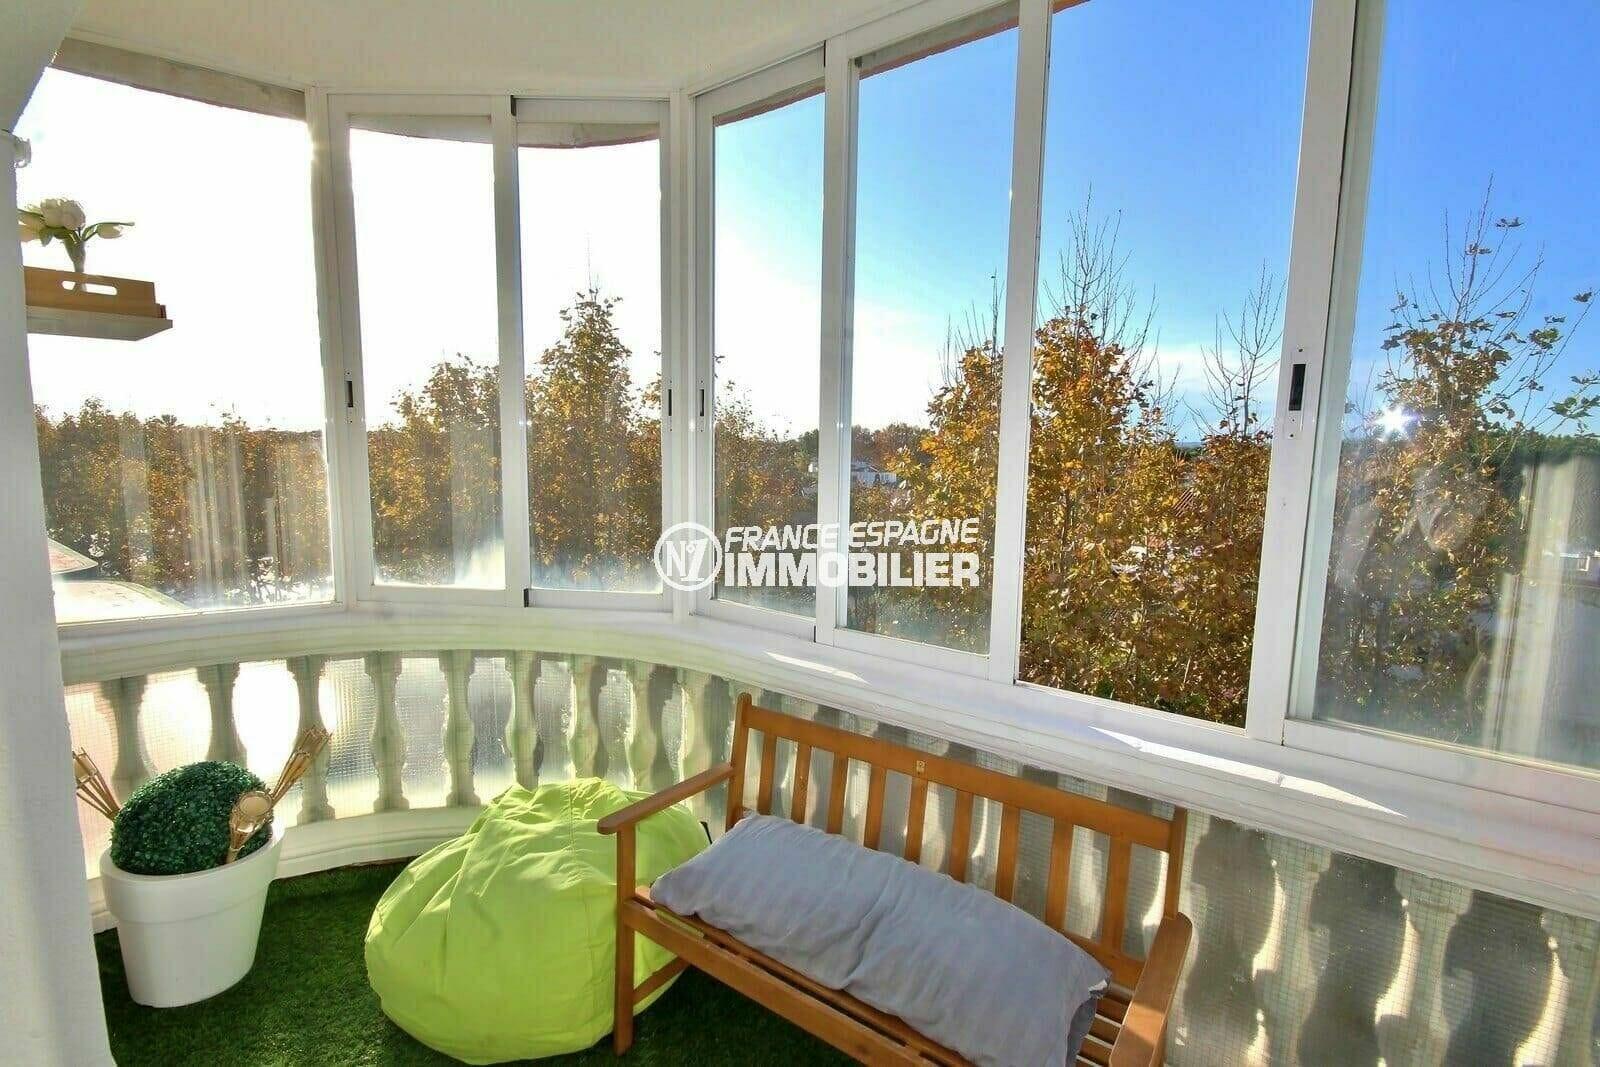 achat appartement empuriabrava, atico, terrasse véranda accès salon avec gazon synthétique